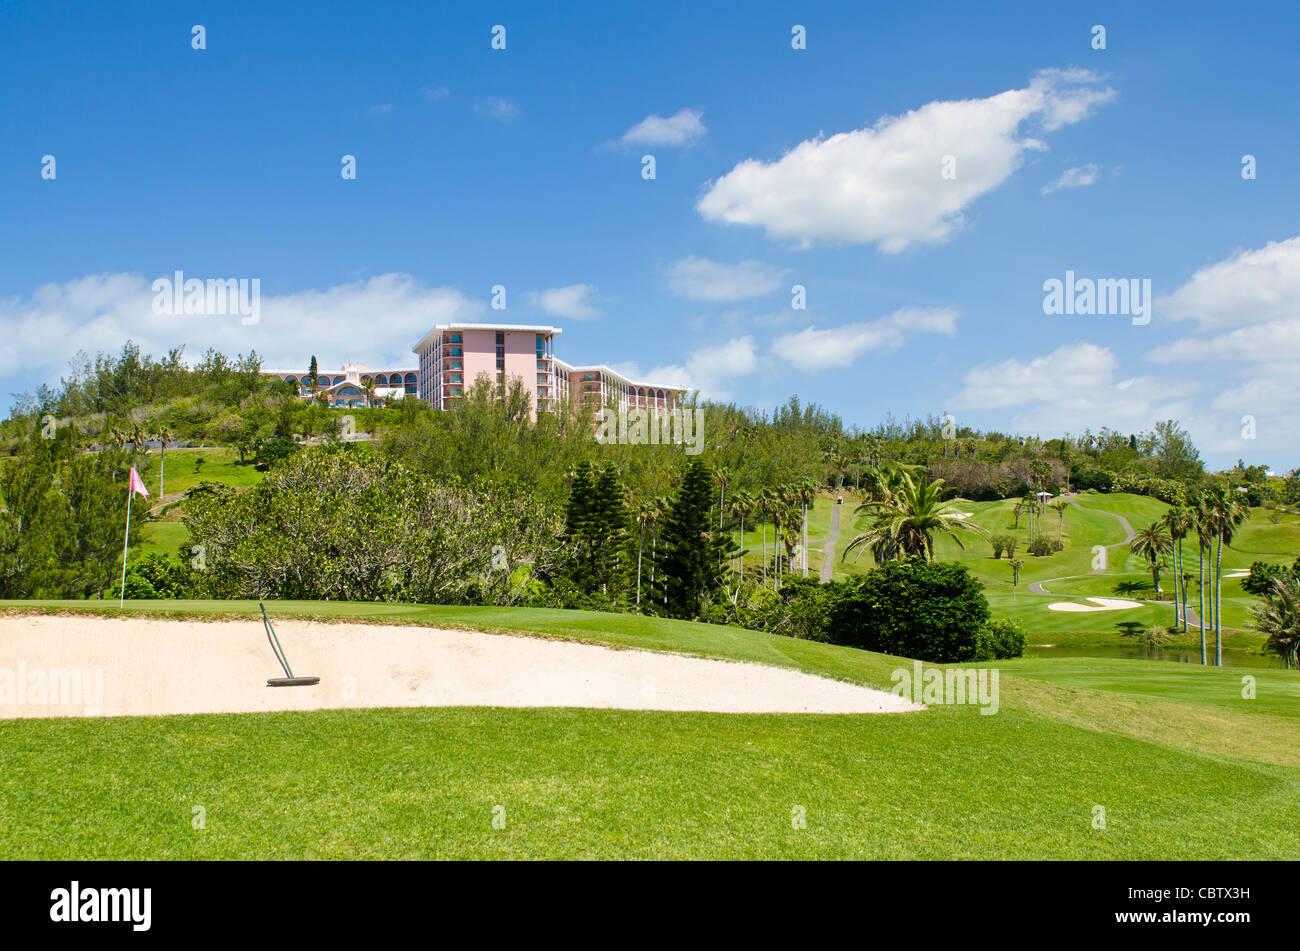 Bermuda. Fairmont Southampton Hotel and Golf Club, Bermuda. - Stock Image